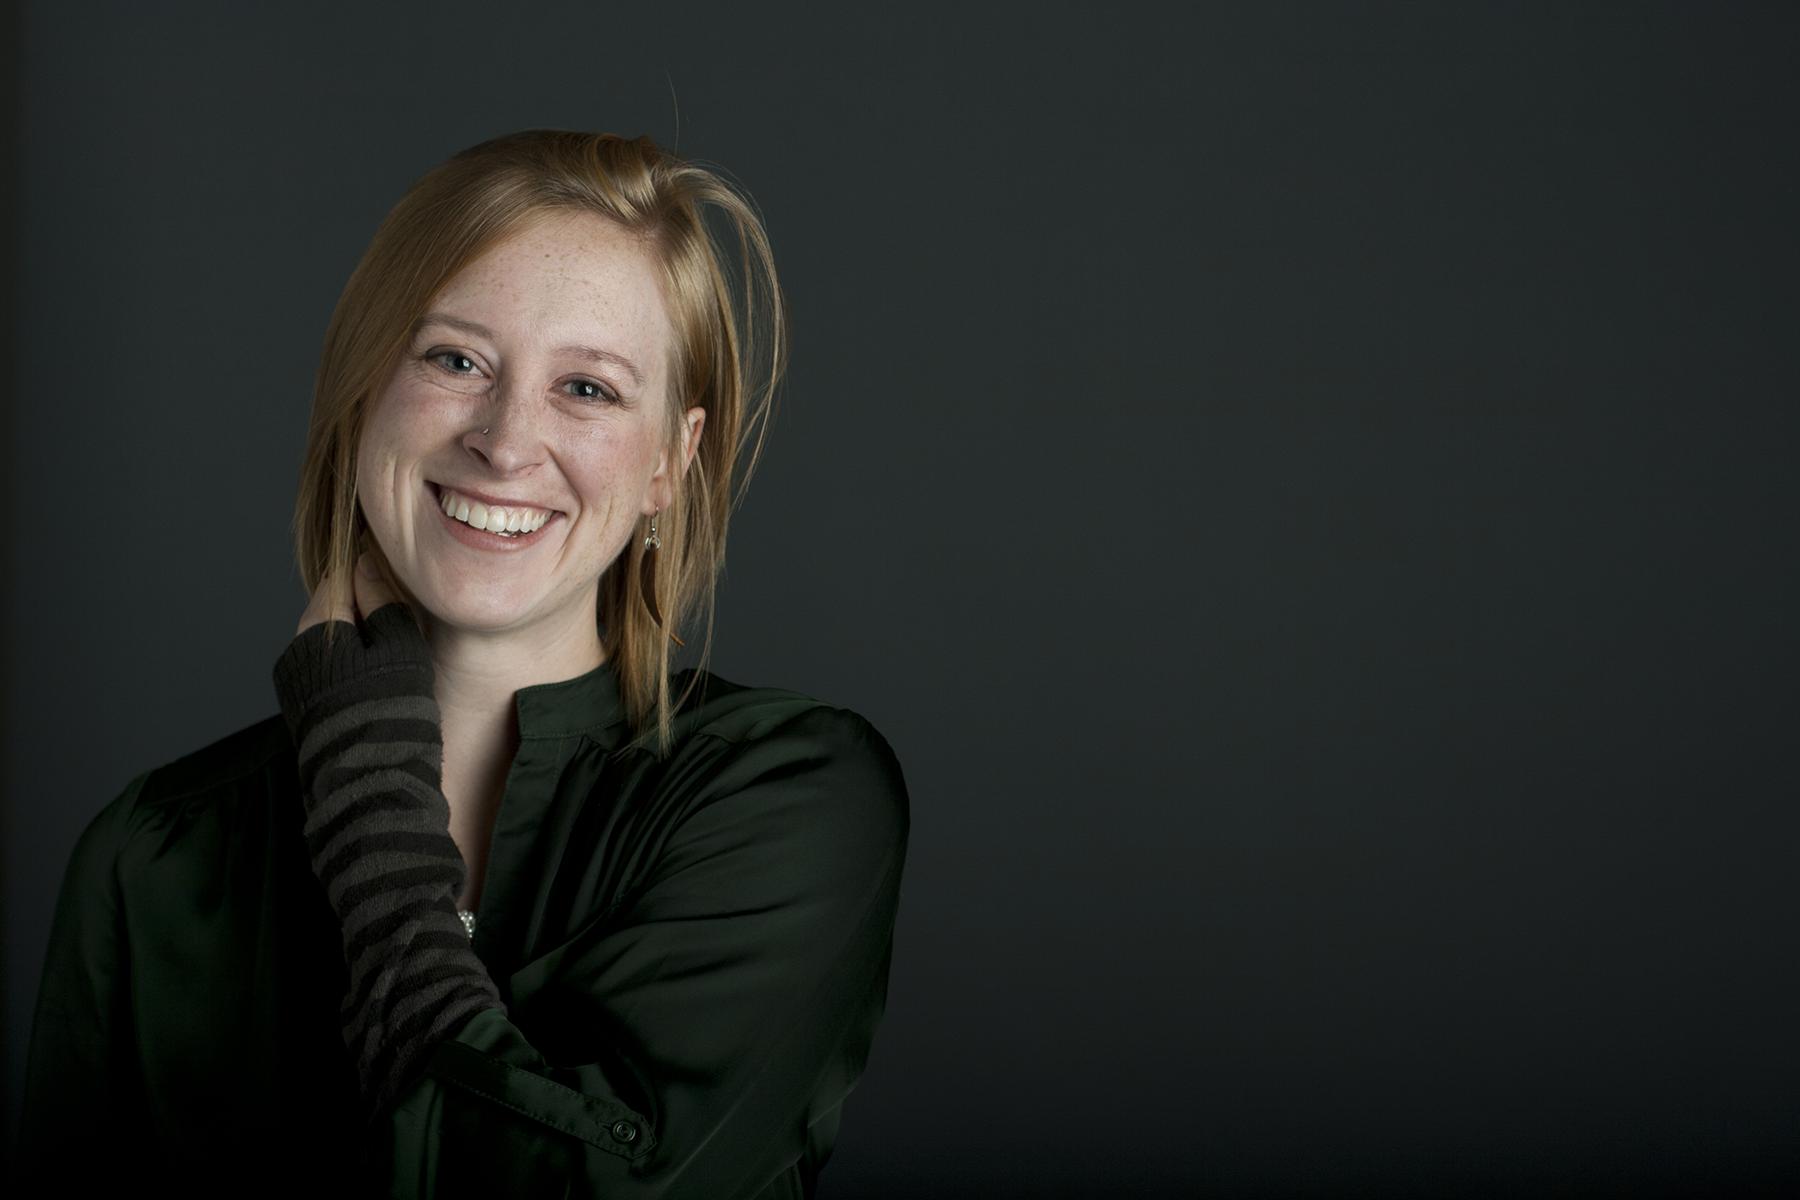 Sarah Atkins Larsen